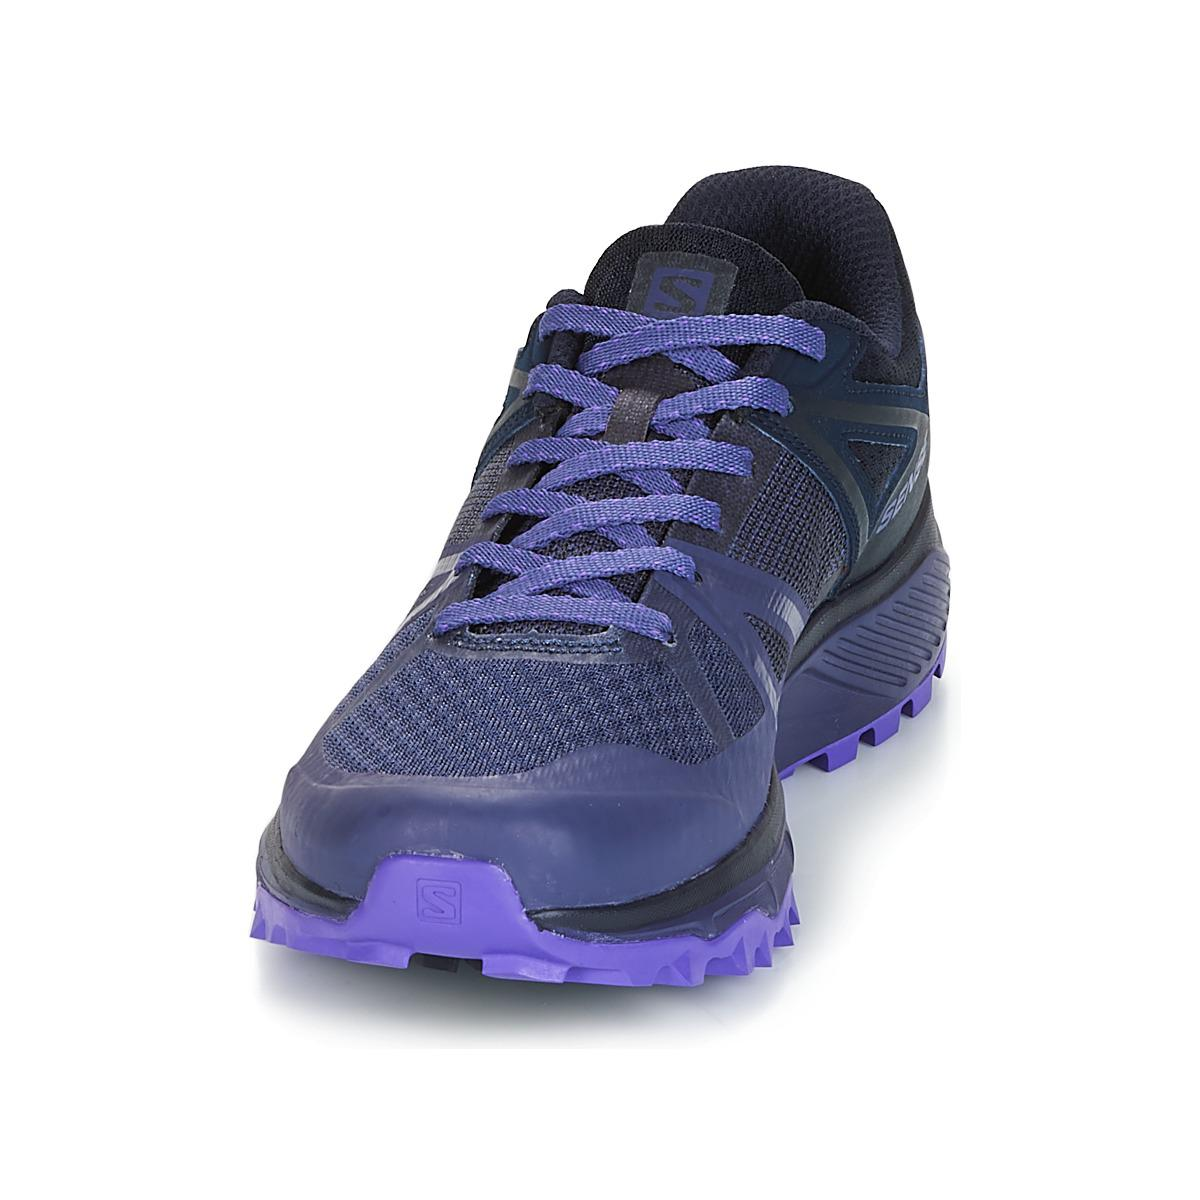 cdd922b5e674 Yves Salomon - Trailster W Women s Running Trainers In Purple - Lyst. View  fullscreen